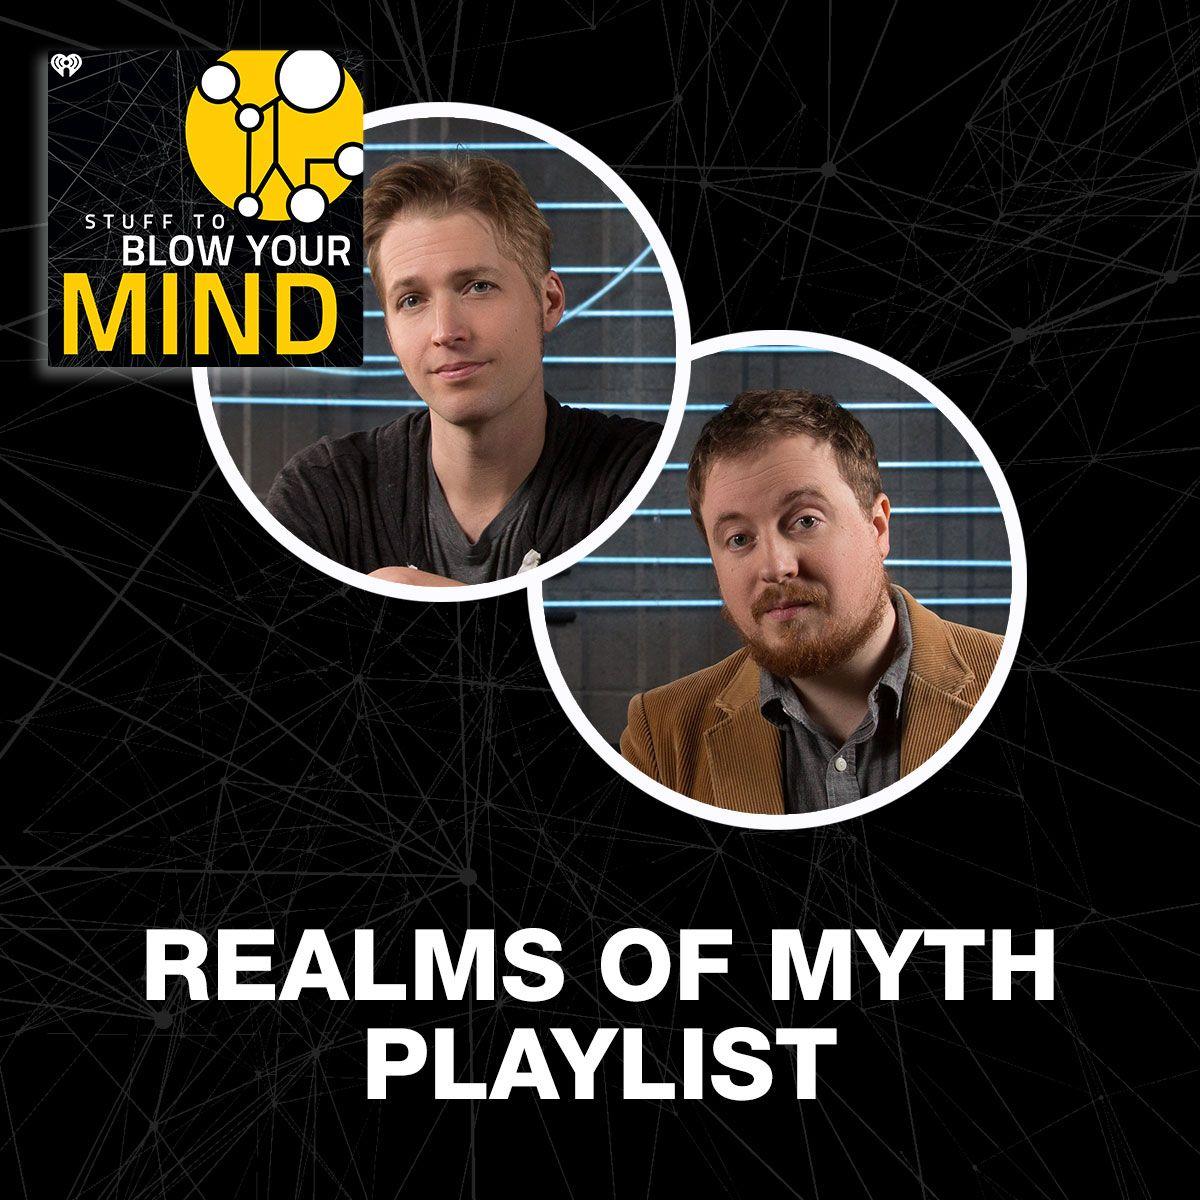 Realms of Myth Playlist, Part 8: Unicorns of the Mythic World